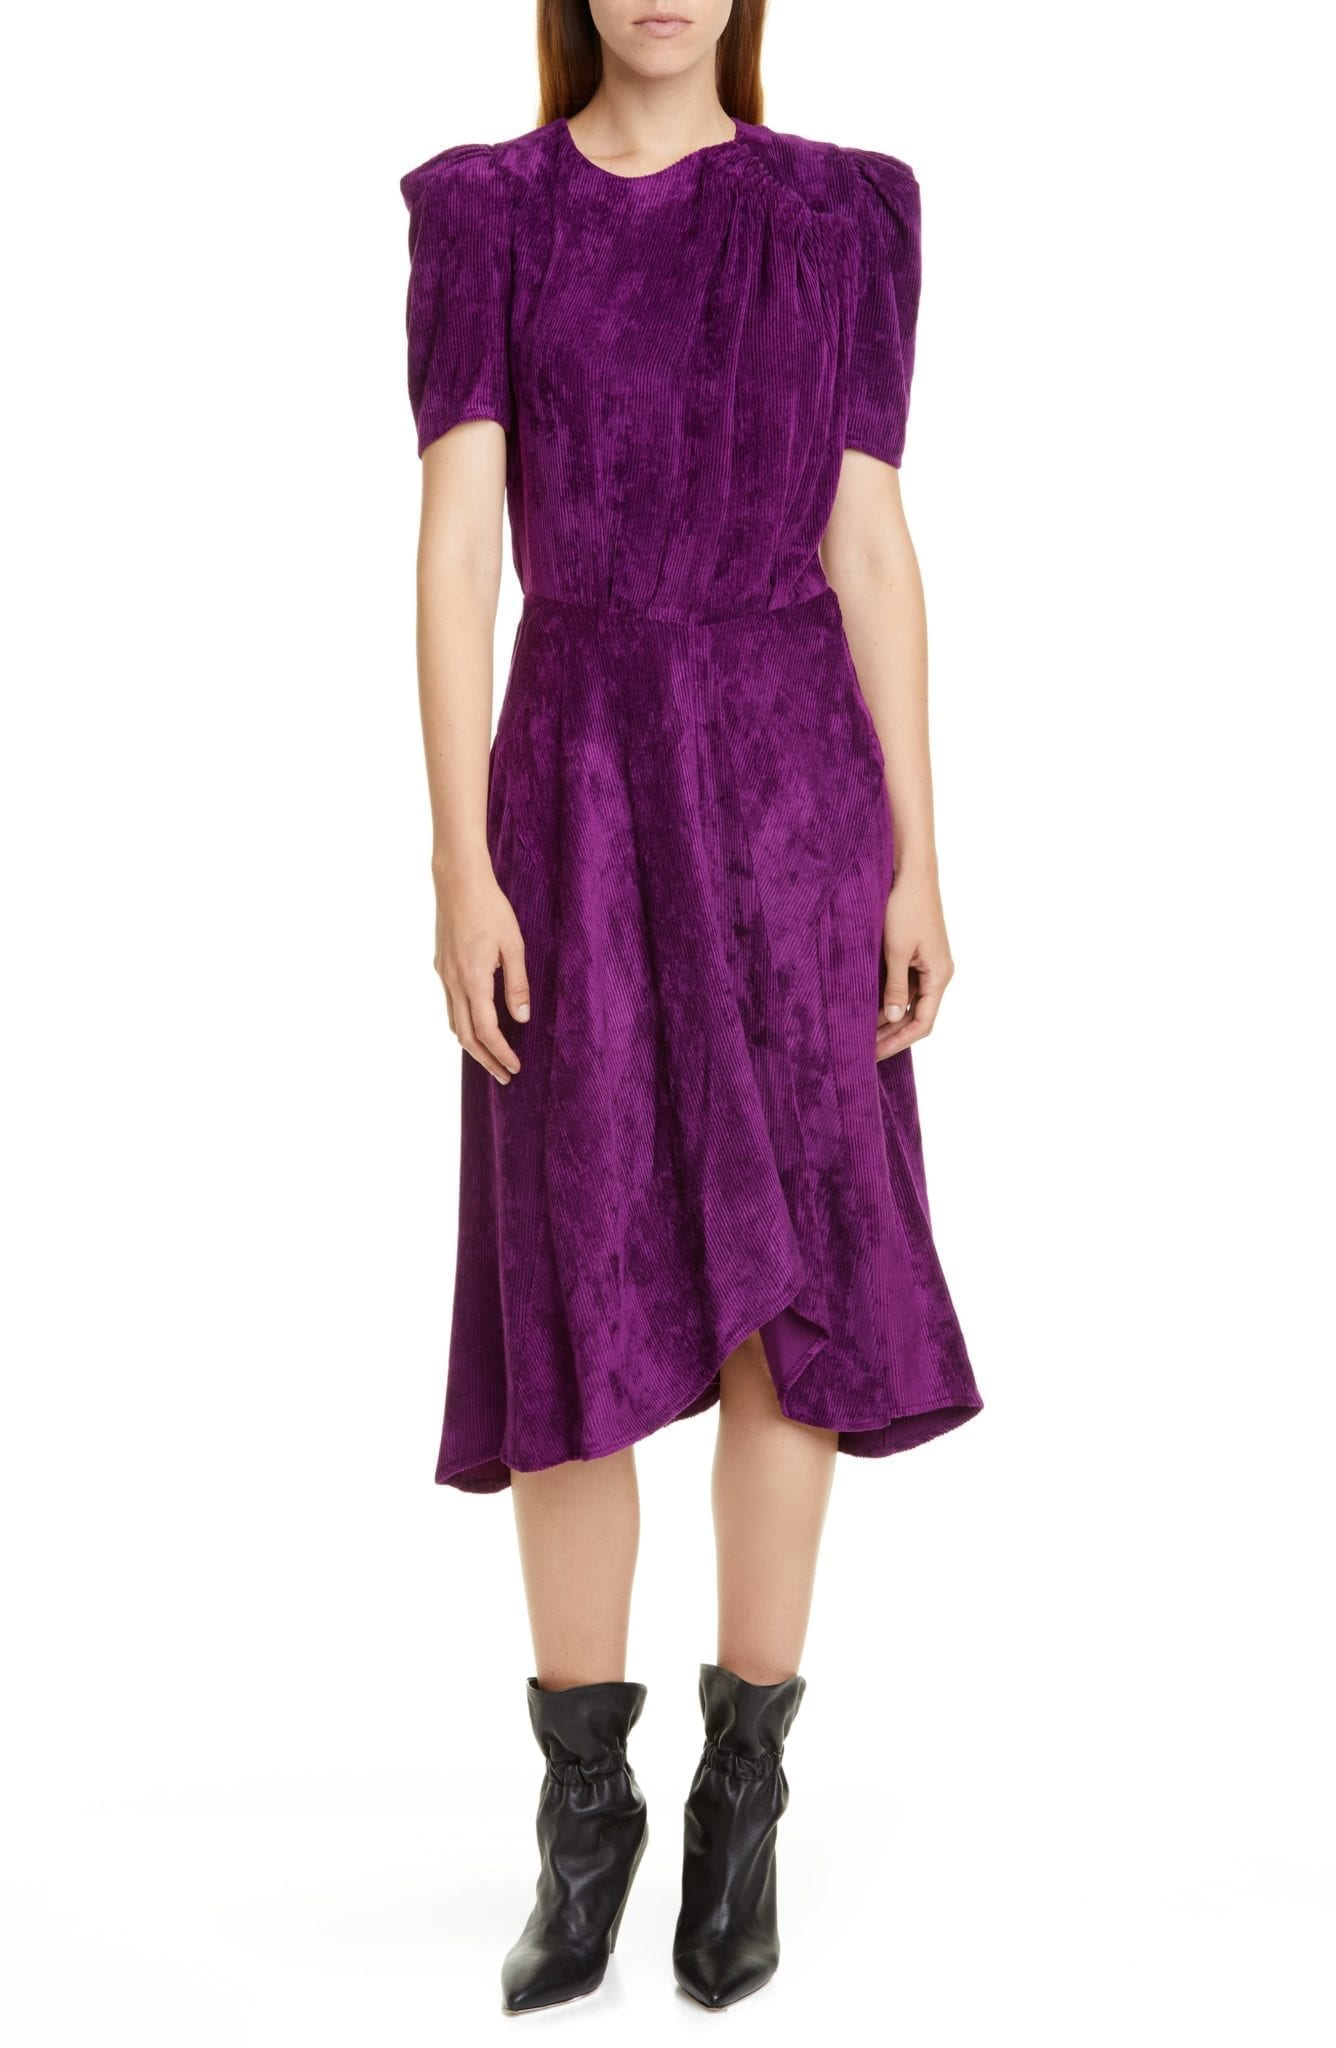 ISABEL MARANT Puff Sleeve Corduroy Dress